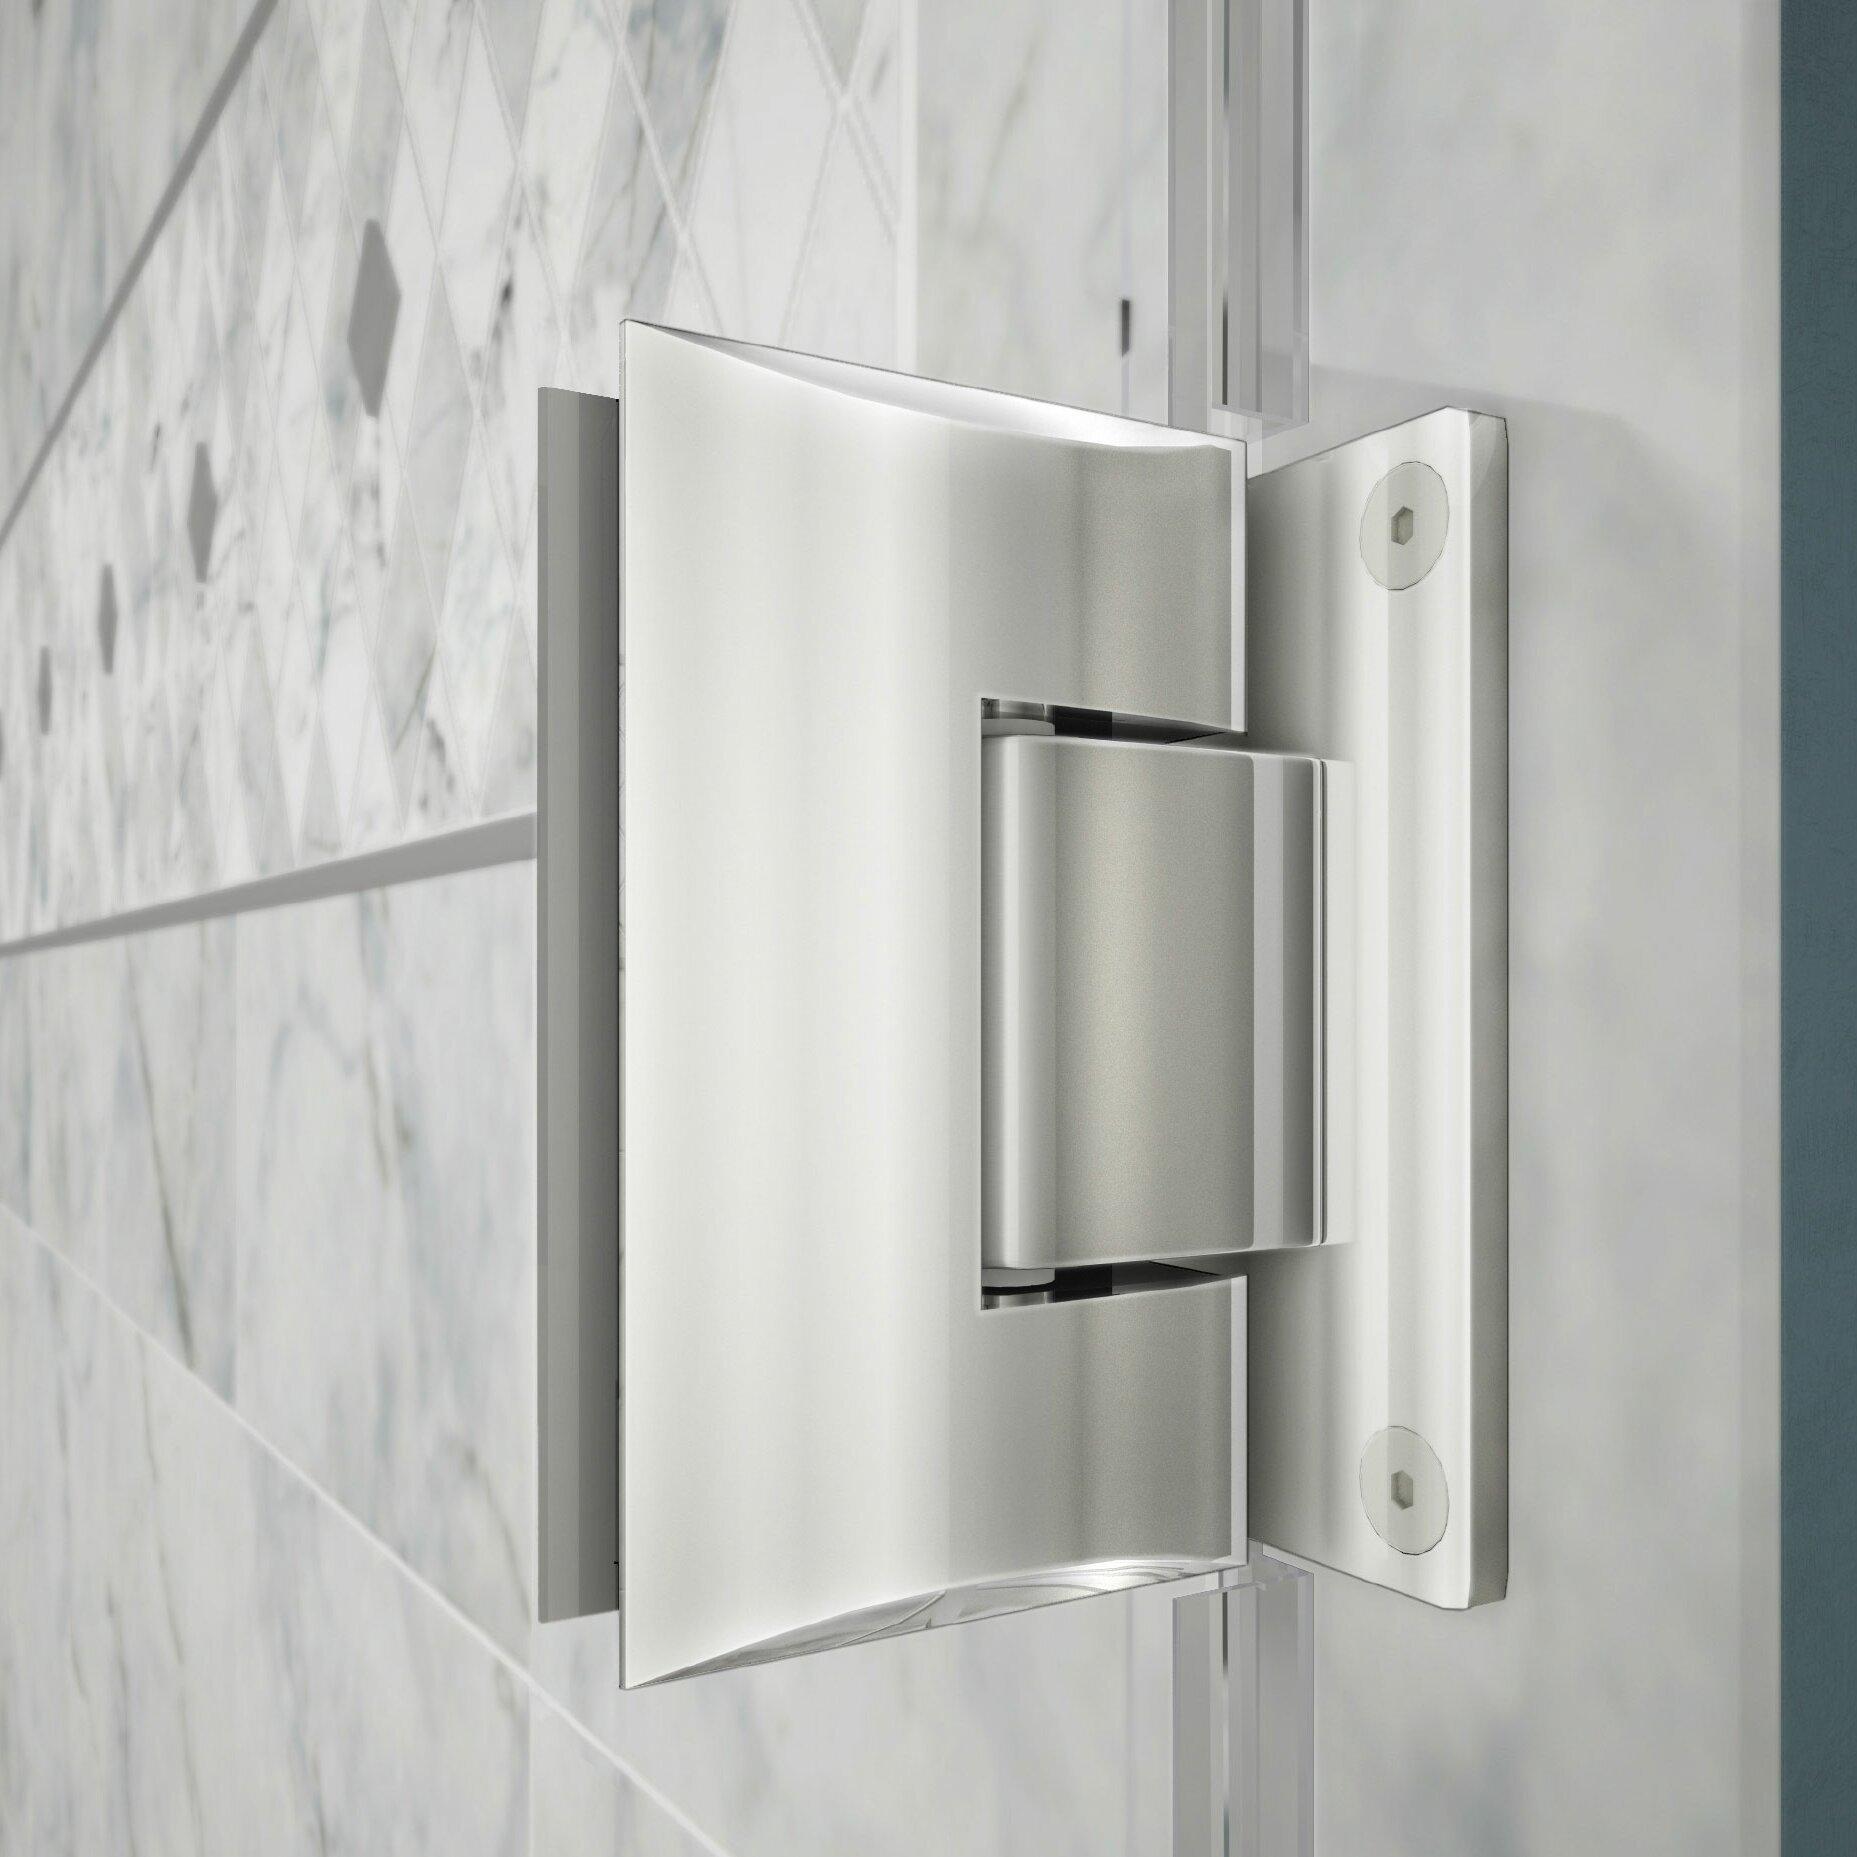 DreamLine Unidoor Plus  W X  D Hinged Shower Enclosure - 36 x 36 corner shower stall